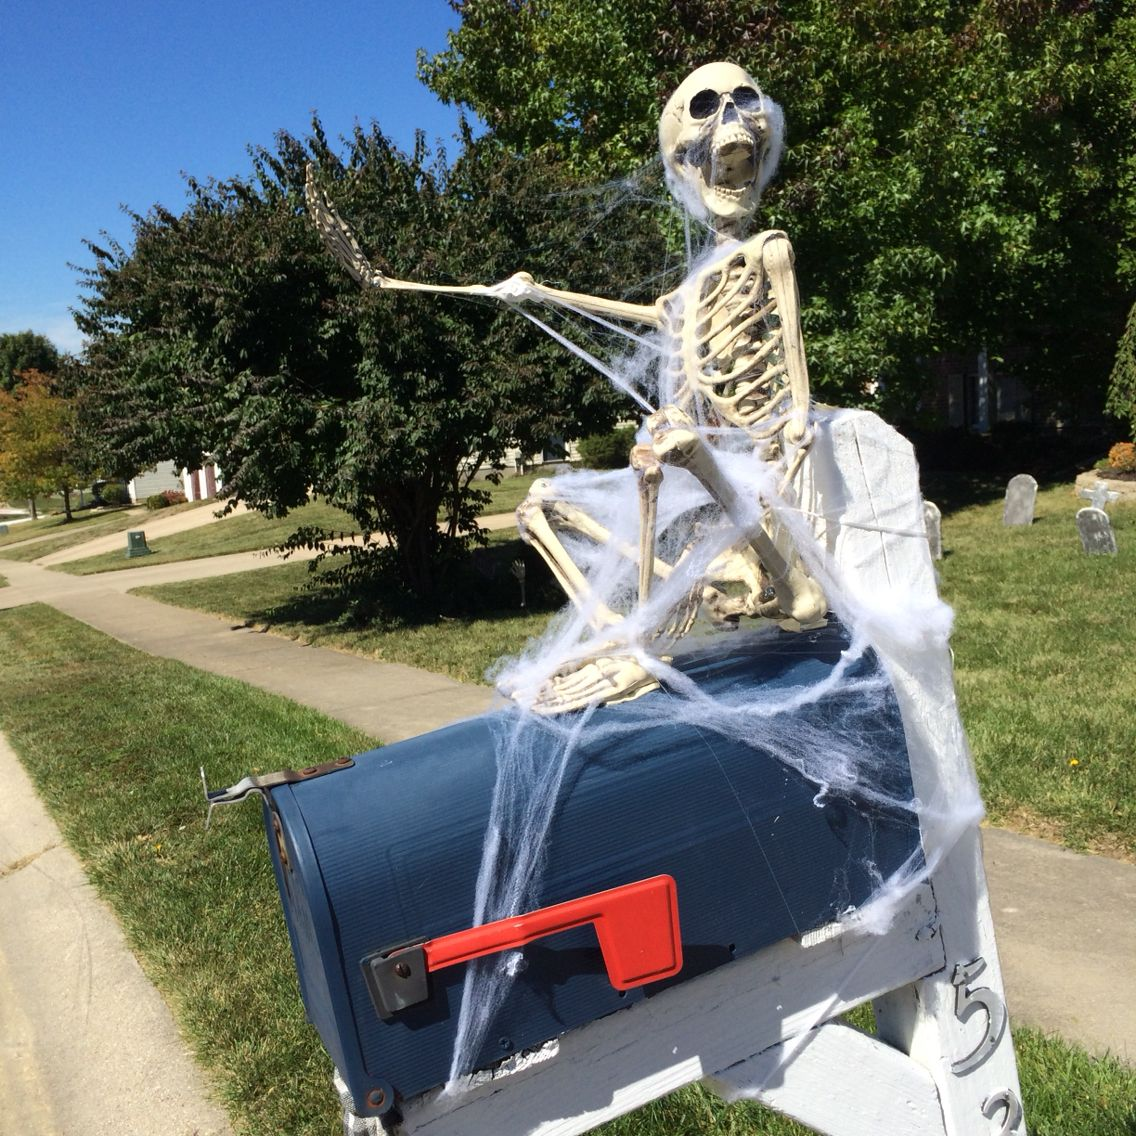 Skeleton mailbox halloween decoration Halloween outdoor